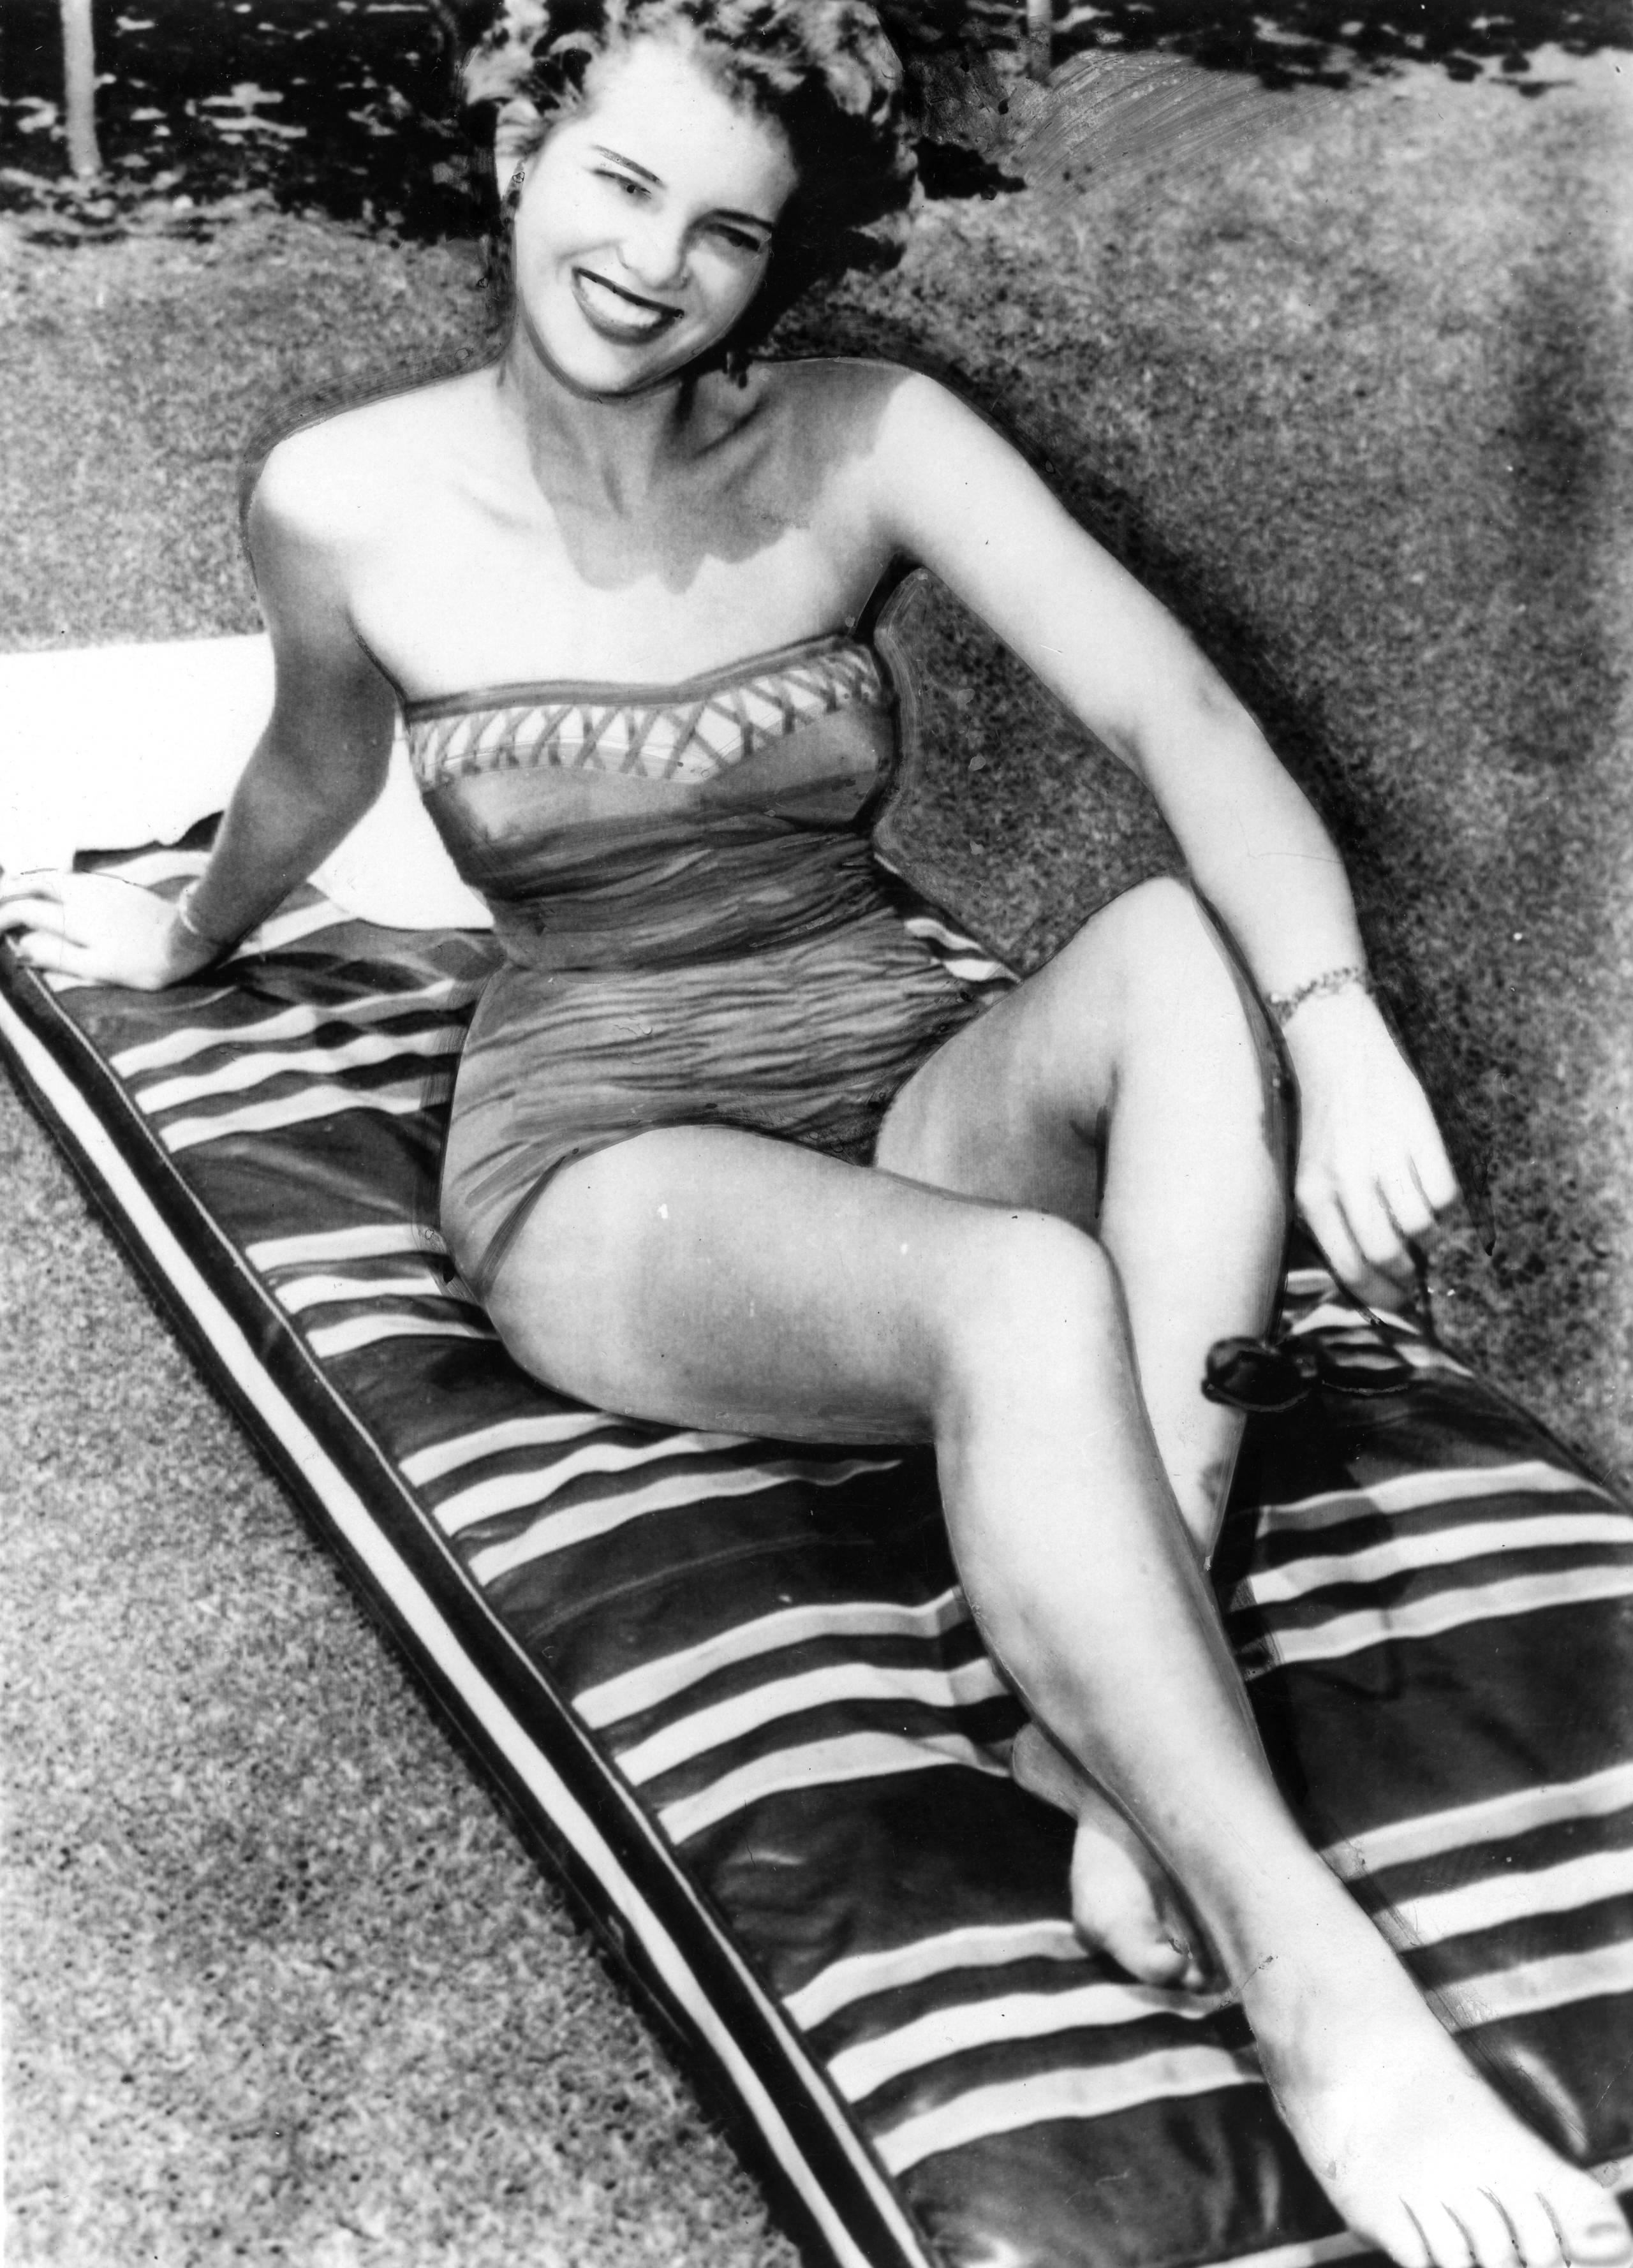 martha rocha, top 2 de miss universe 1954. primeira brasileira a participar de miss universe.†  - Página 4 83790911